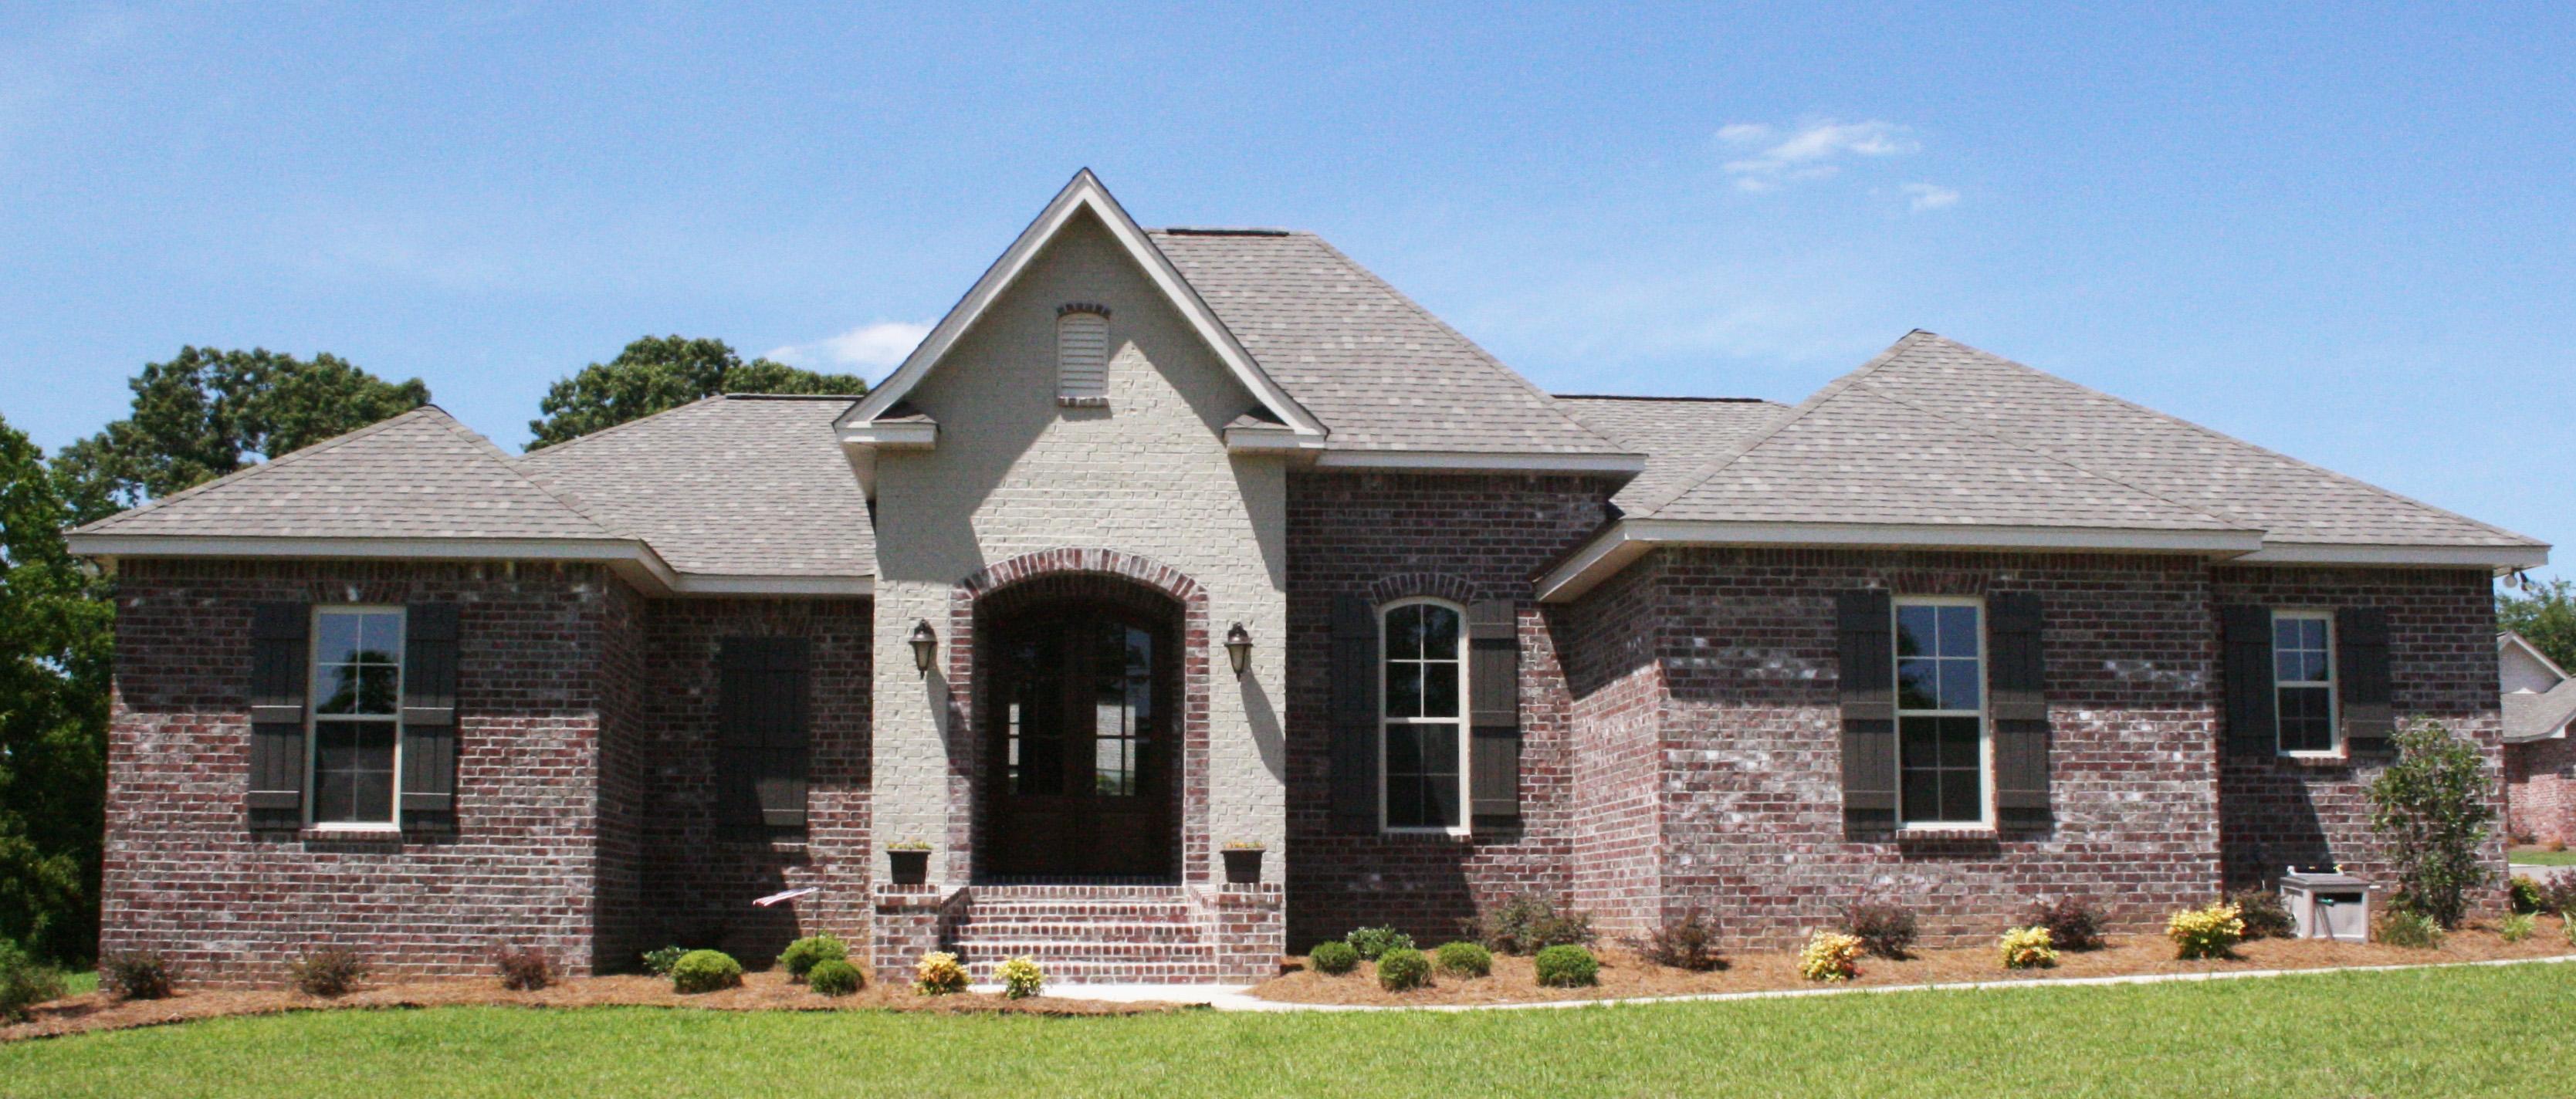 Separate master suite 11766hz architectural designs for Architecturaldesigns com house plan 56364sm asp